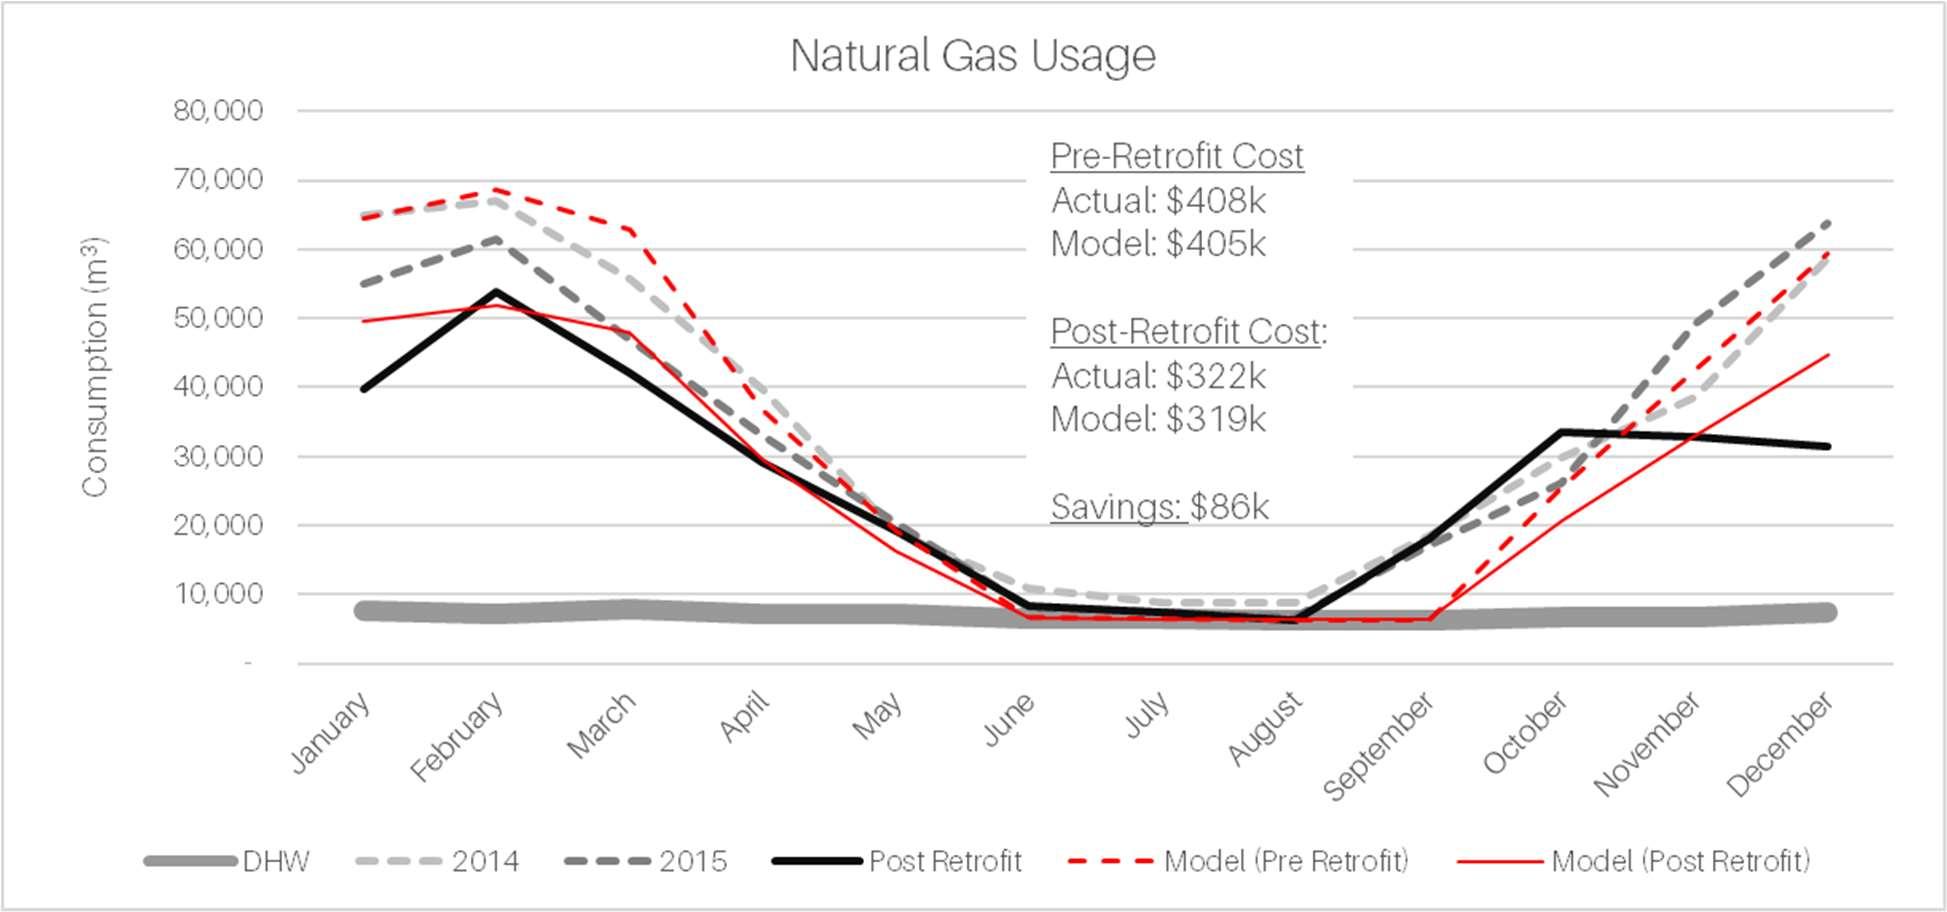 Natural Gas Usage Actual vs Model Pre- and Post-Retrofit